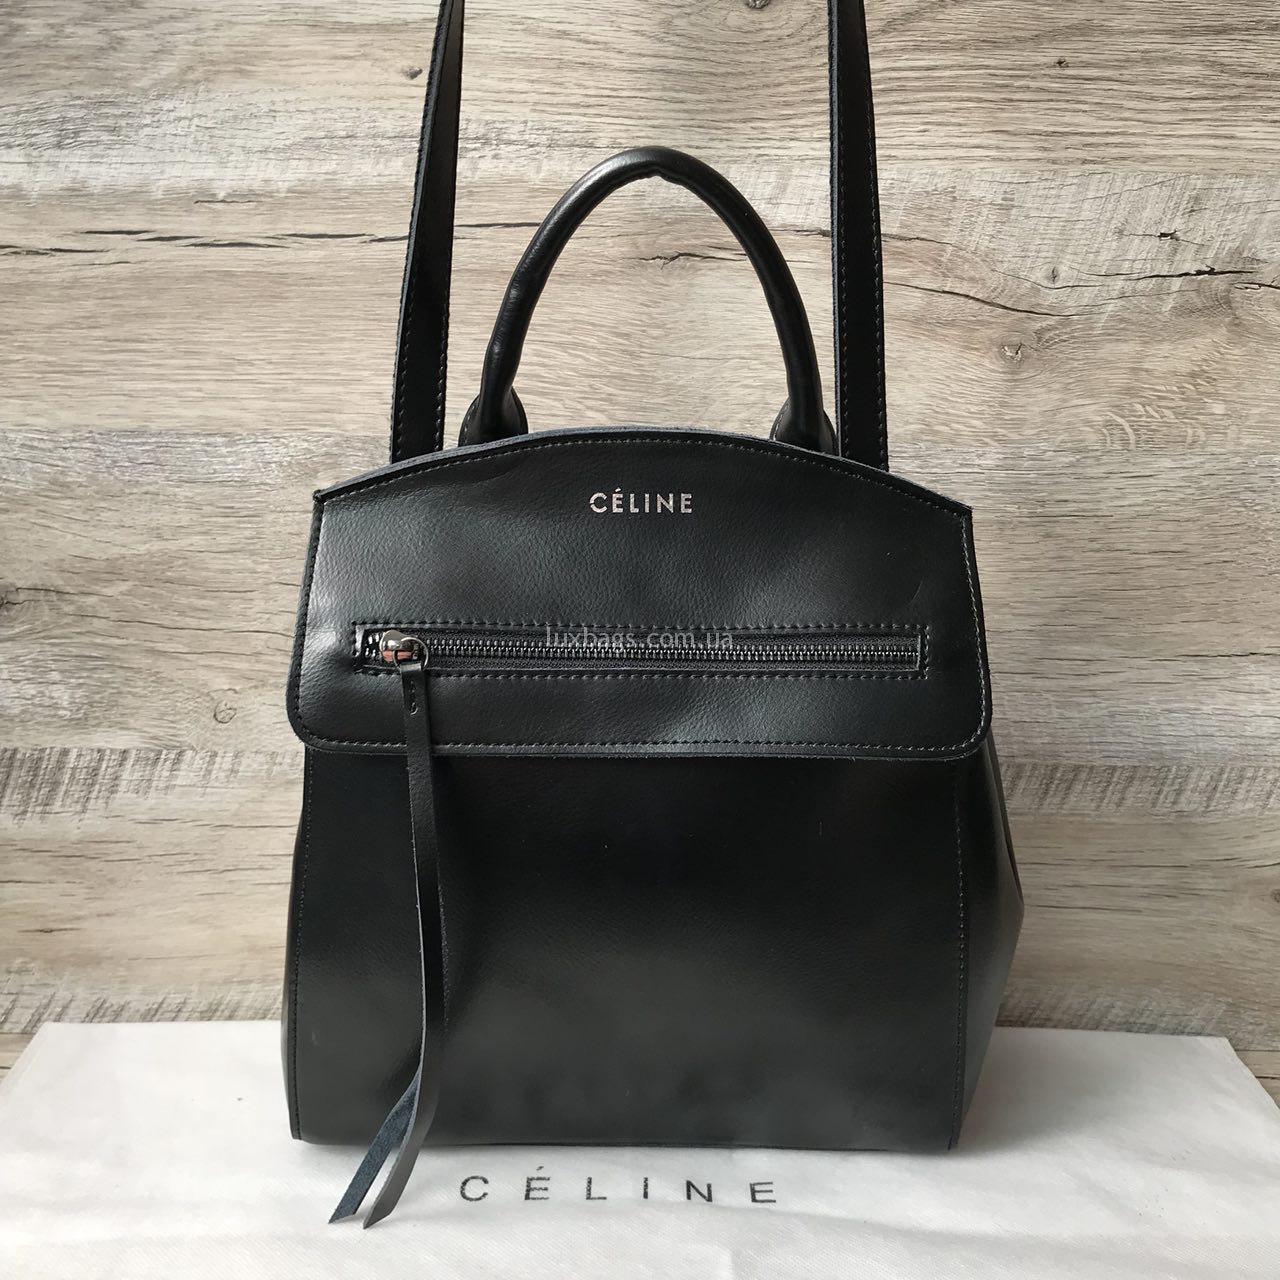 42124b0d1b8b Купить Кожаный рюкзак, рюкзак-сумка Celine (Селин) на lux-bags